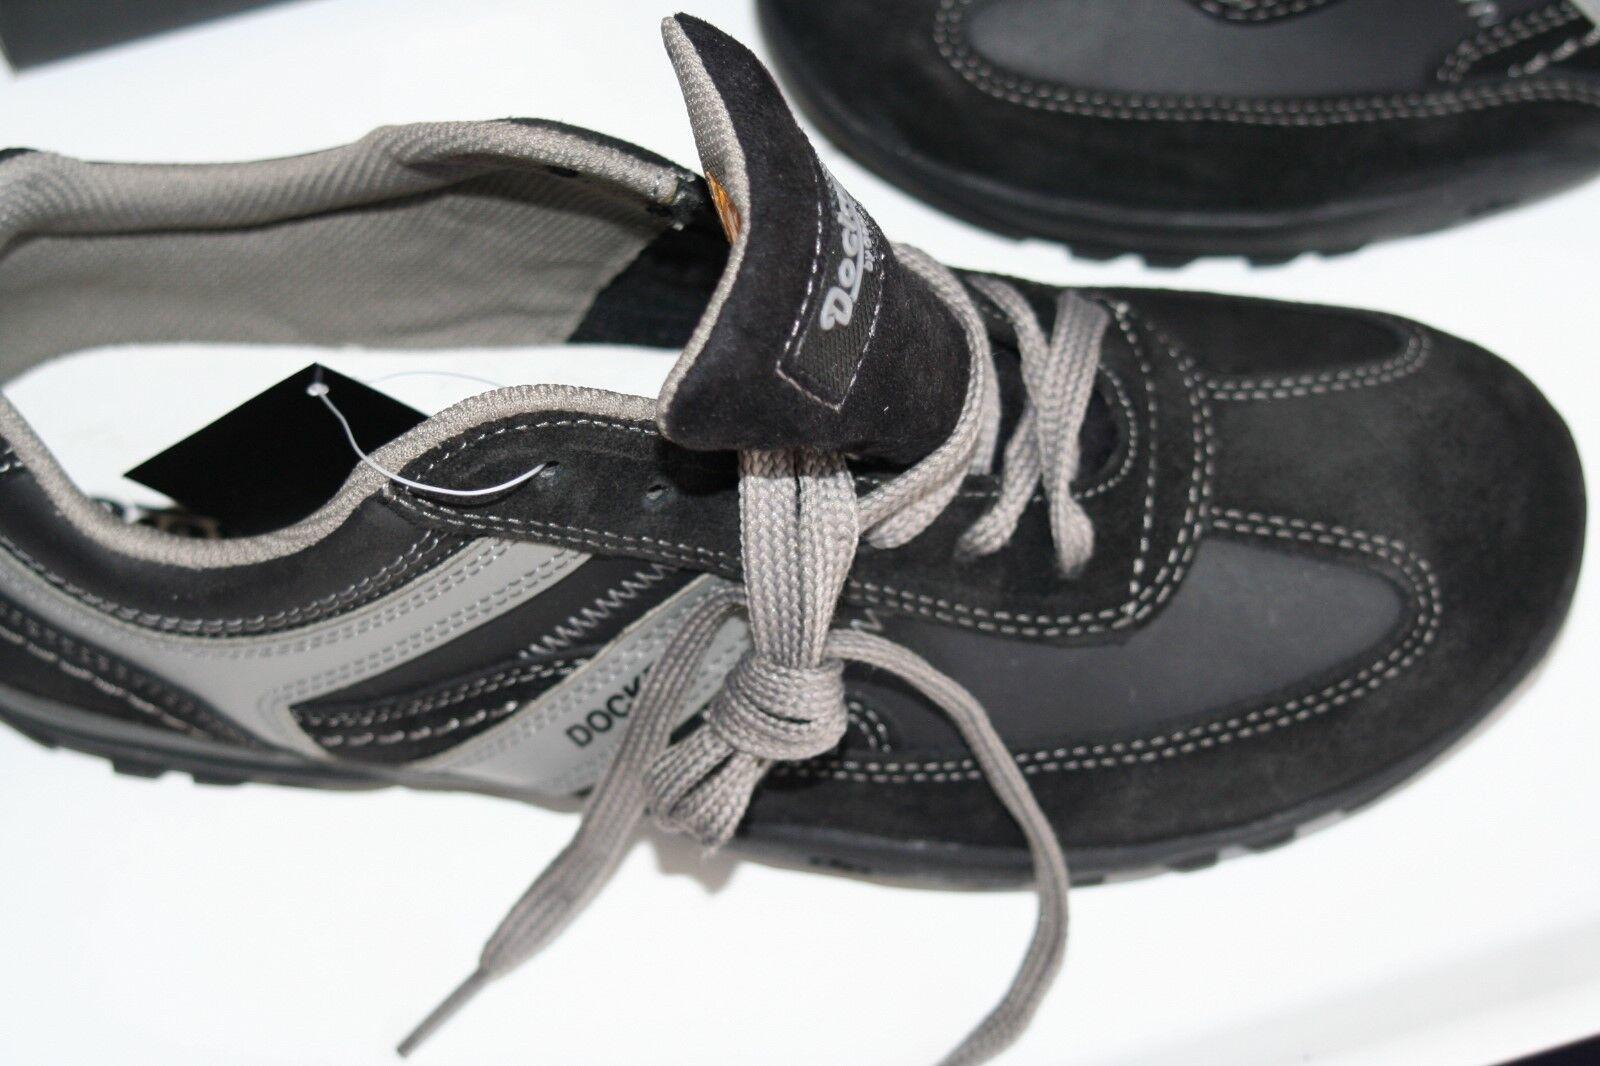 DOCKERS  Grau MOCASSIN  Neu schwarz Grau  usw  echt Leder  42 3f0344